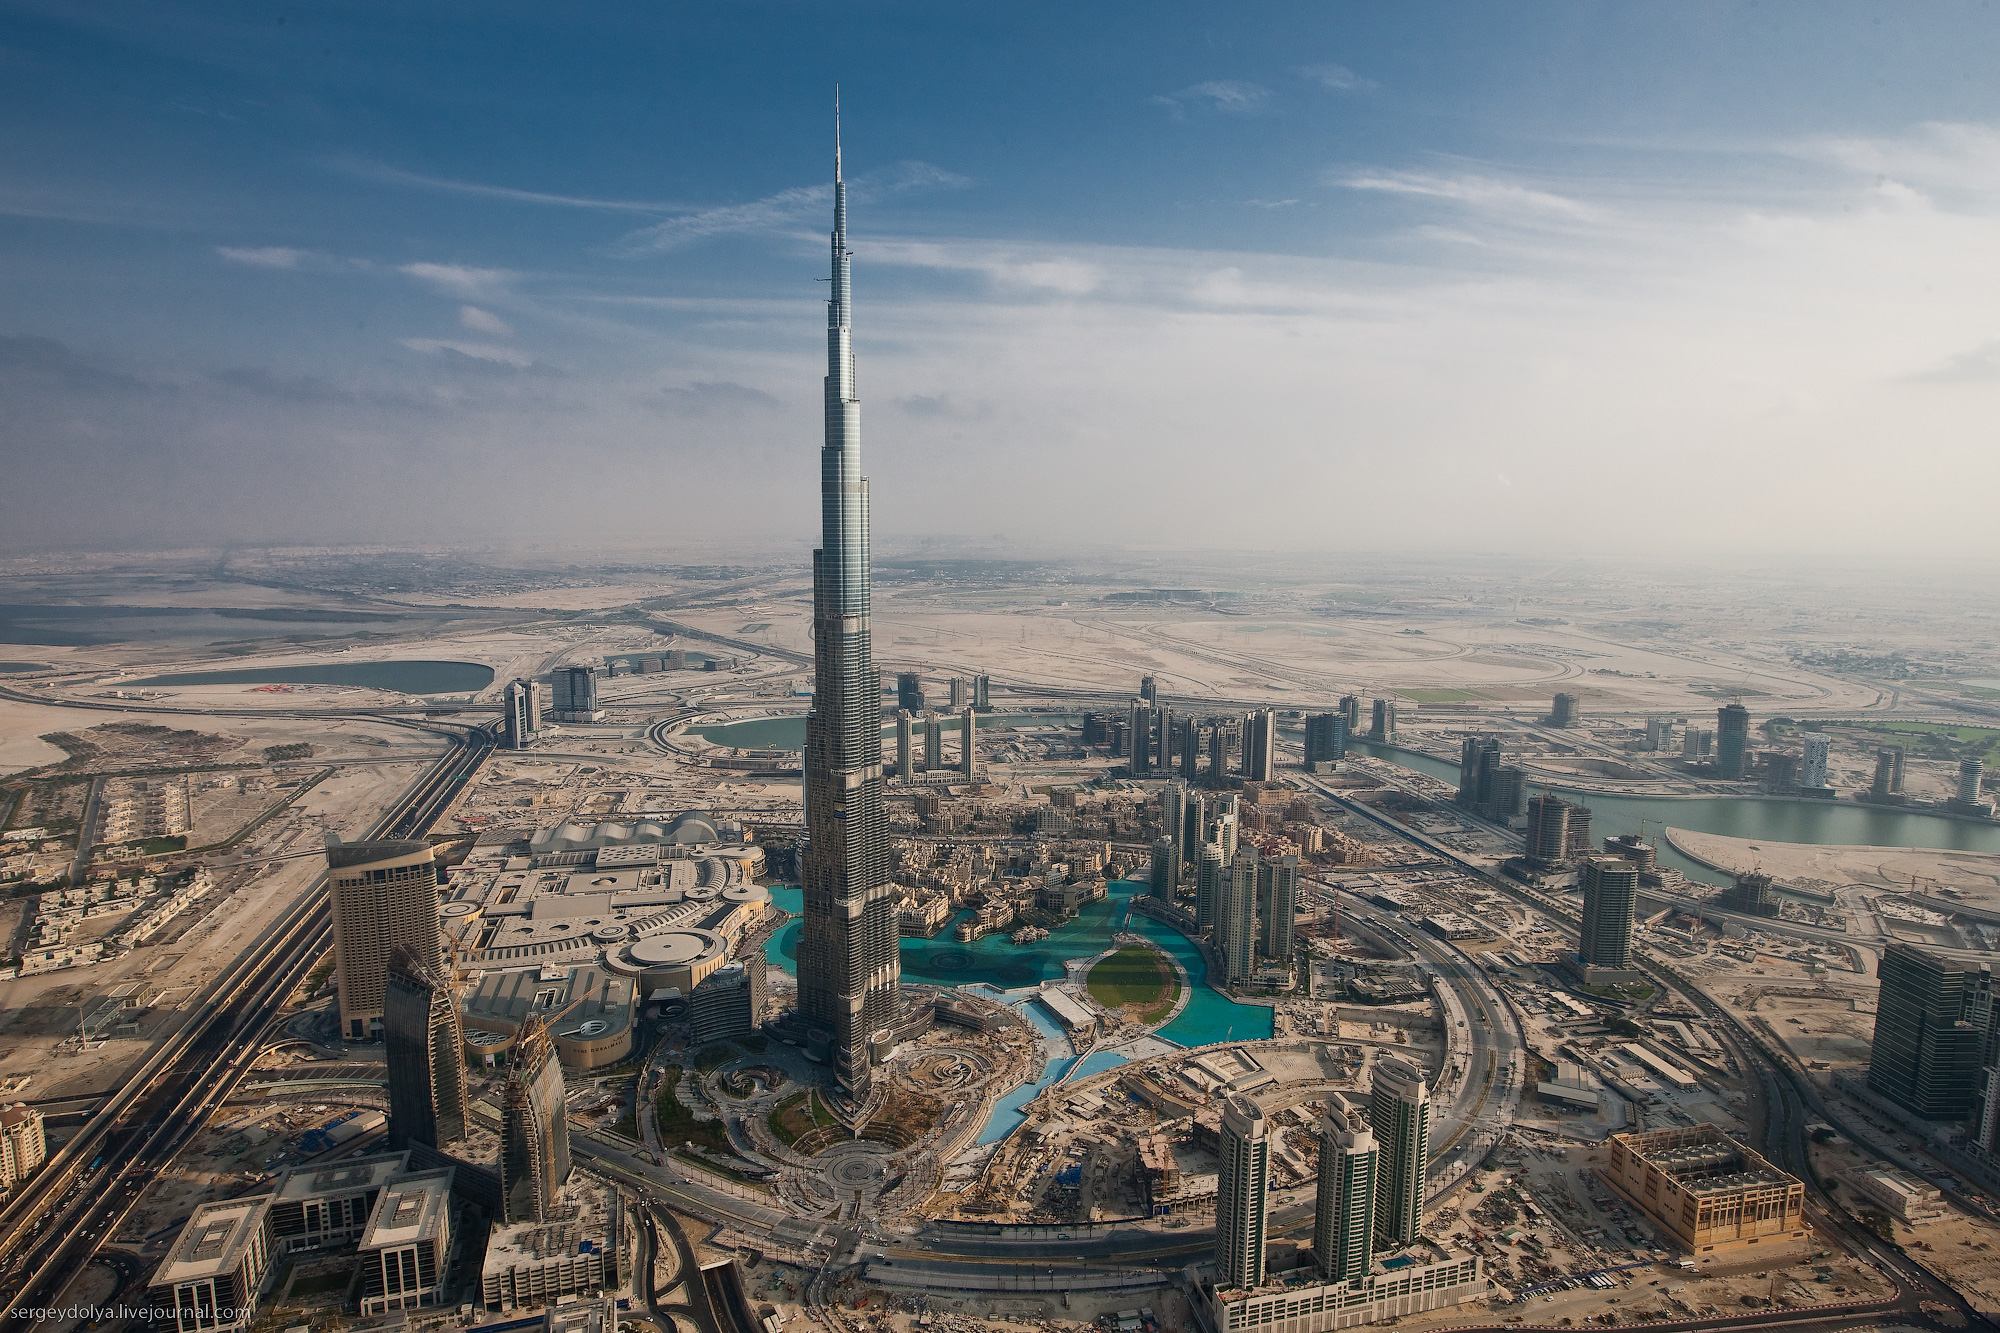 Дубай башня бурдж халифа высота тенерифе дом купить